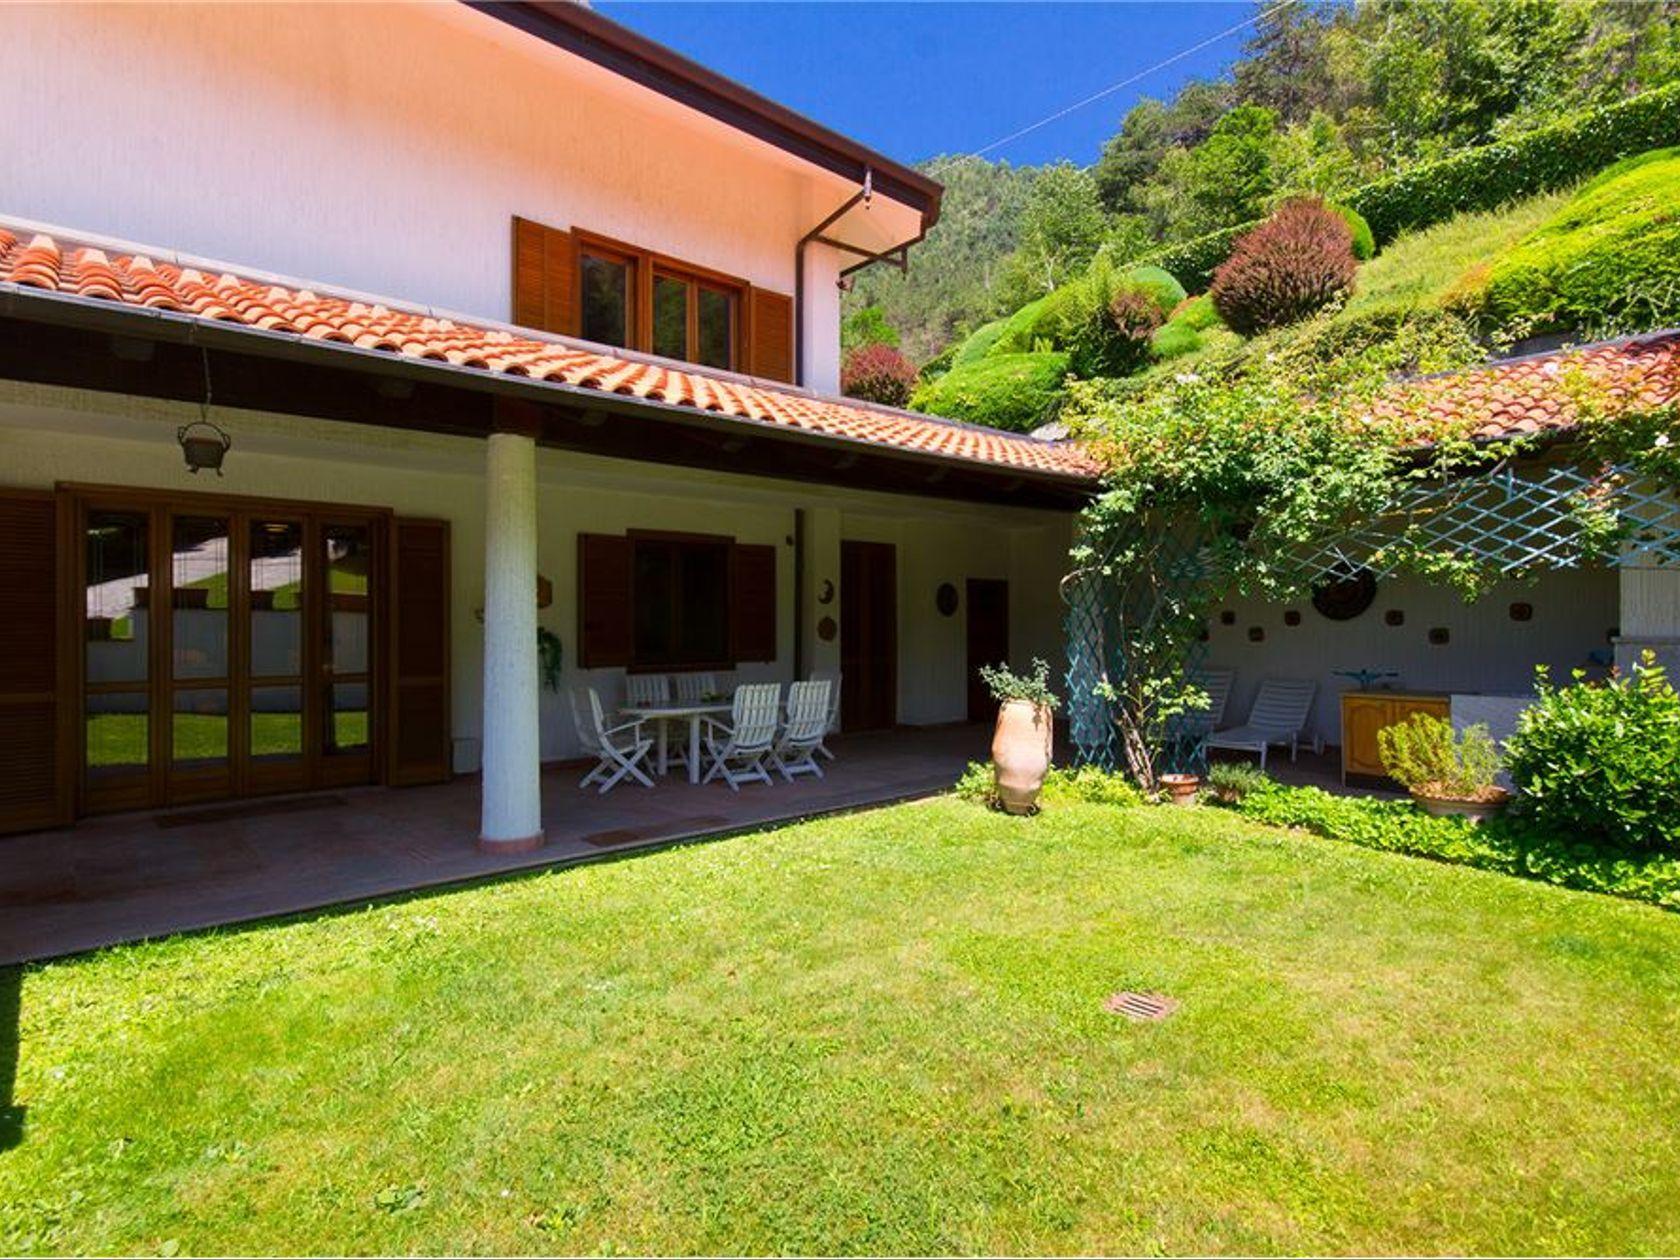 Villa singola Lanzo Torinese, TO Vendita - Foto 5